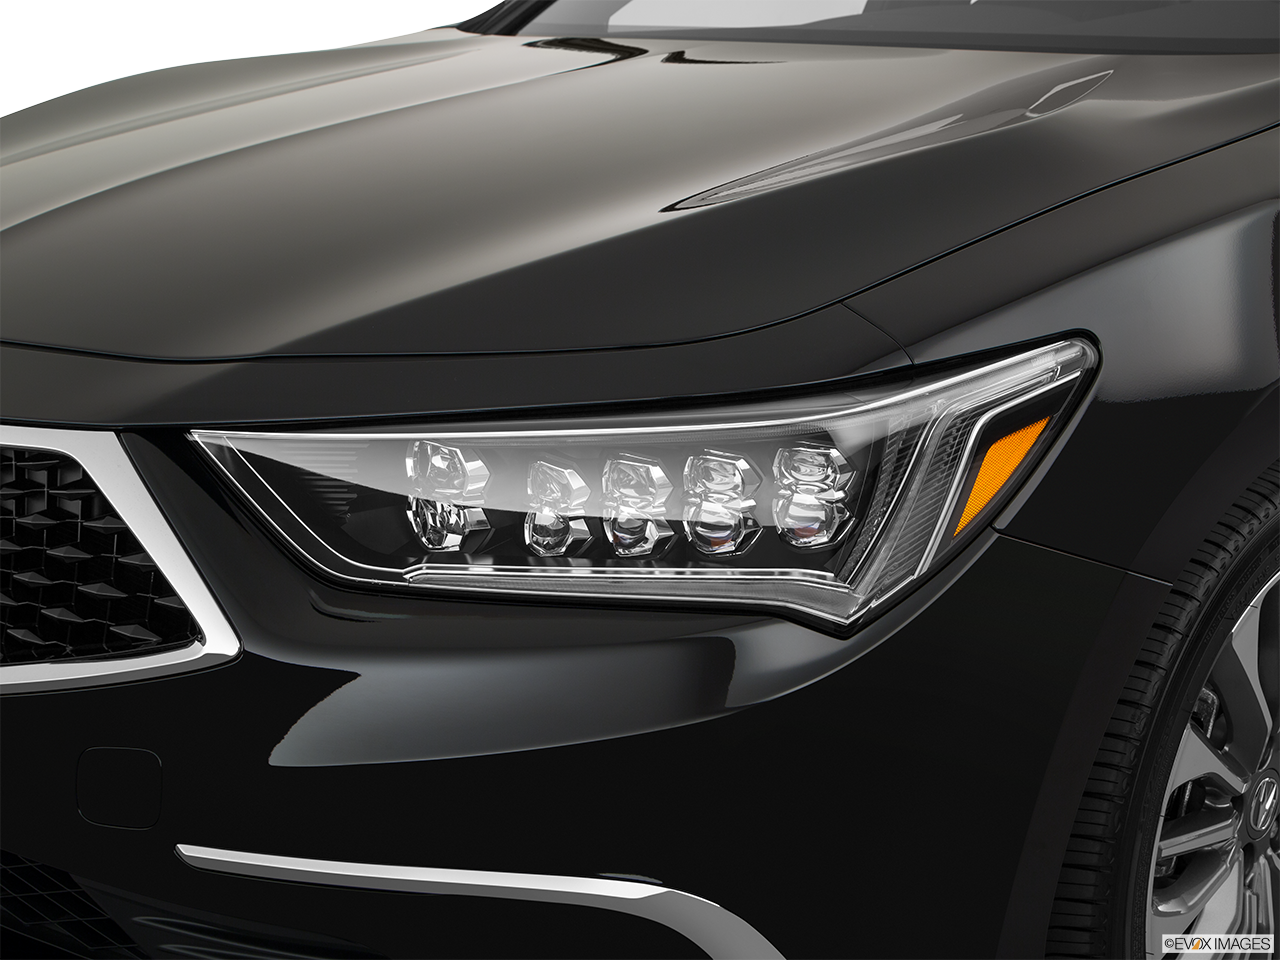 2020 Acura RLX photo